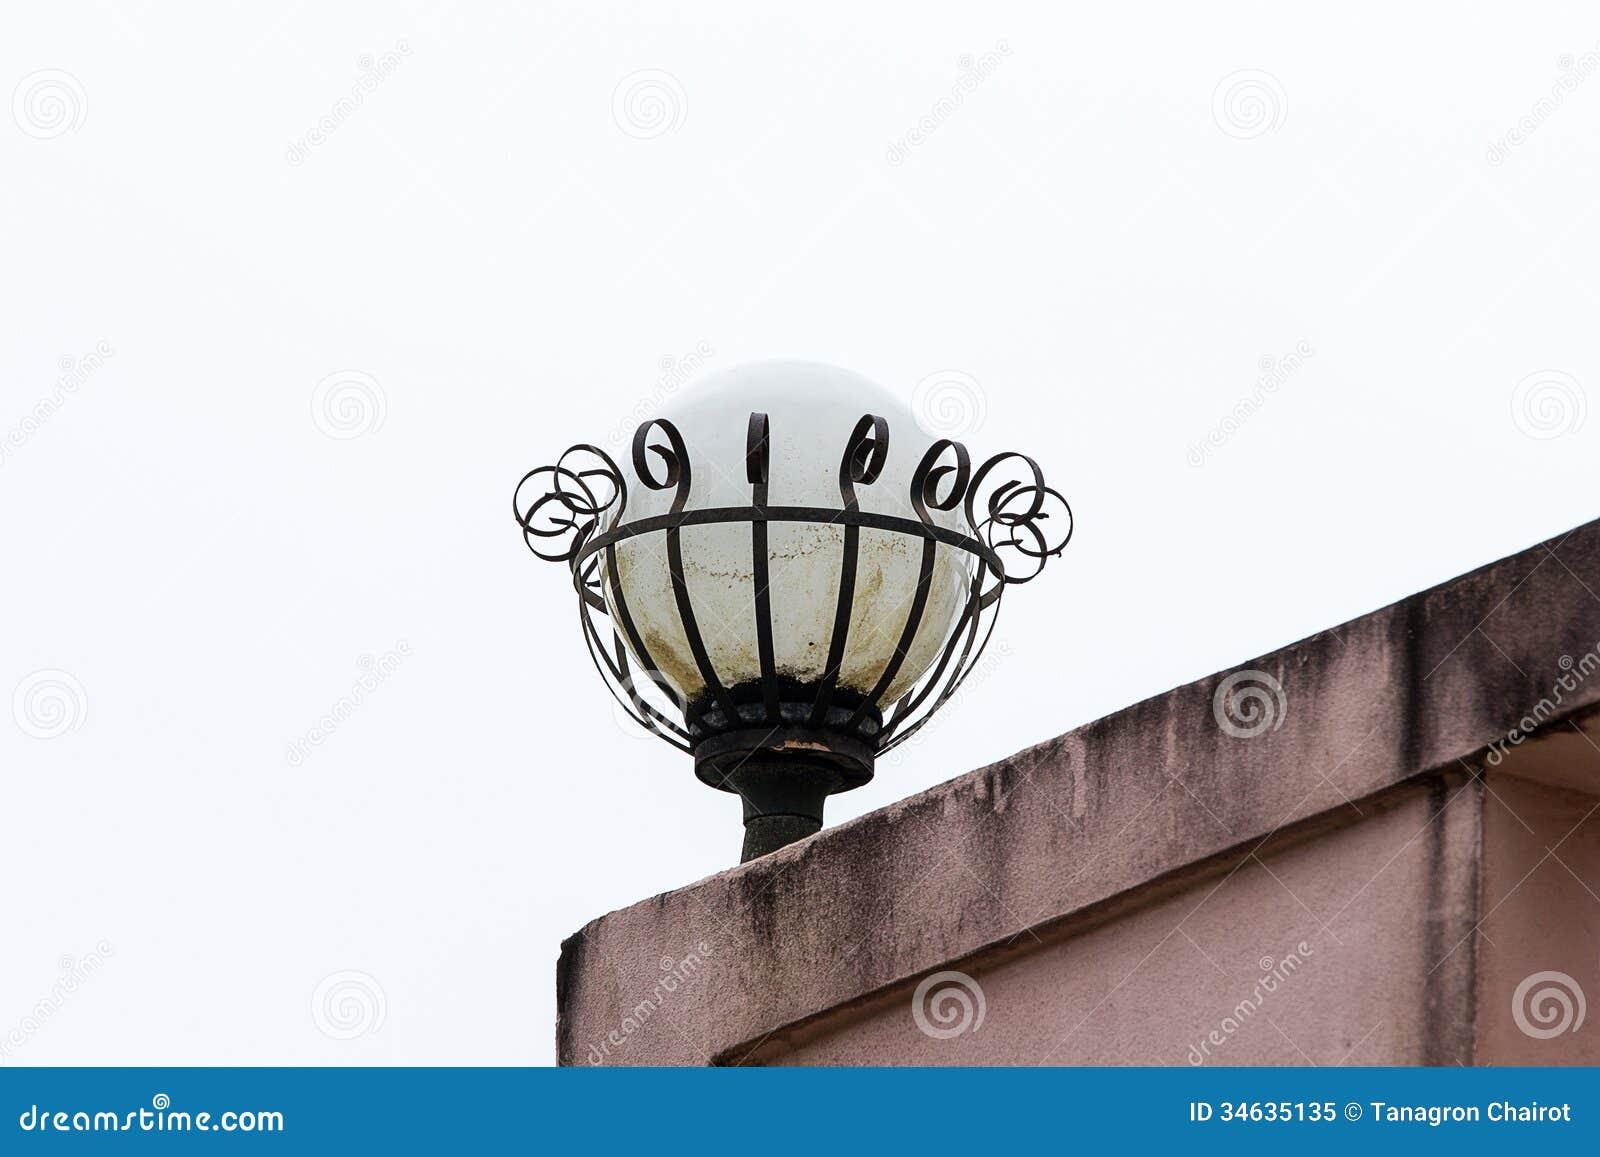 old lamp royalty free stock photo image 34635135. Black Bedroom Furniture Sets. Home Design Ideas